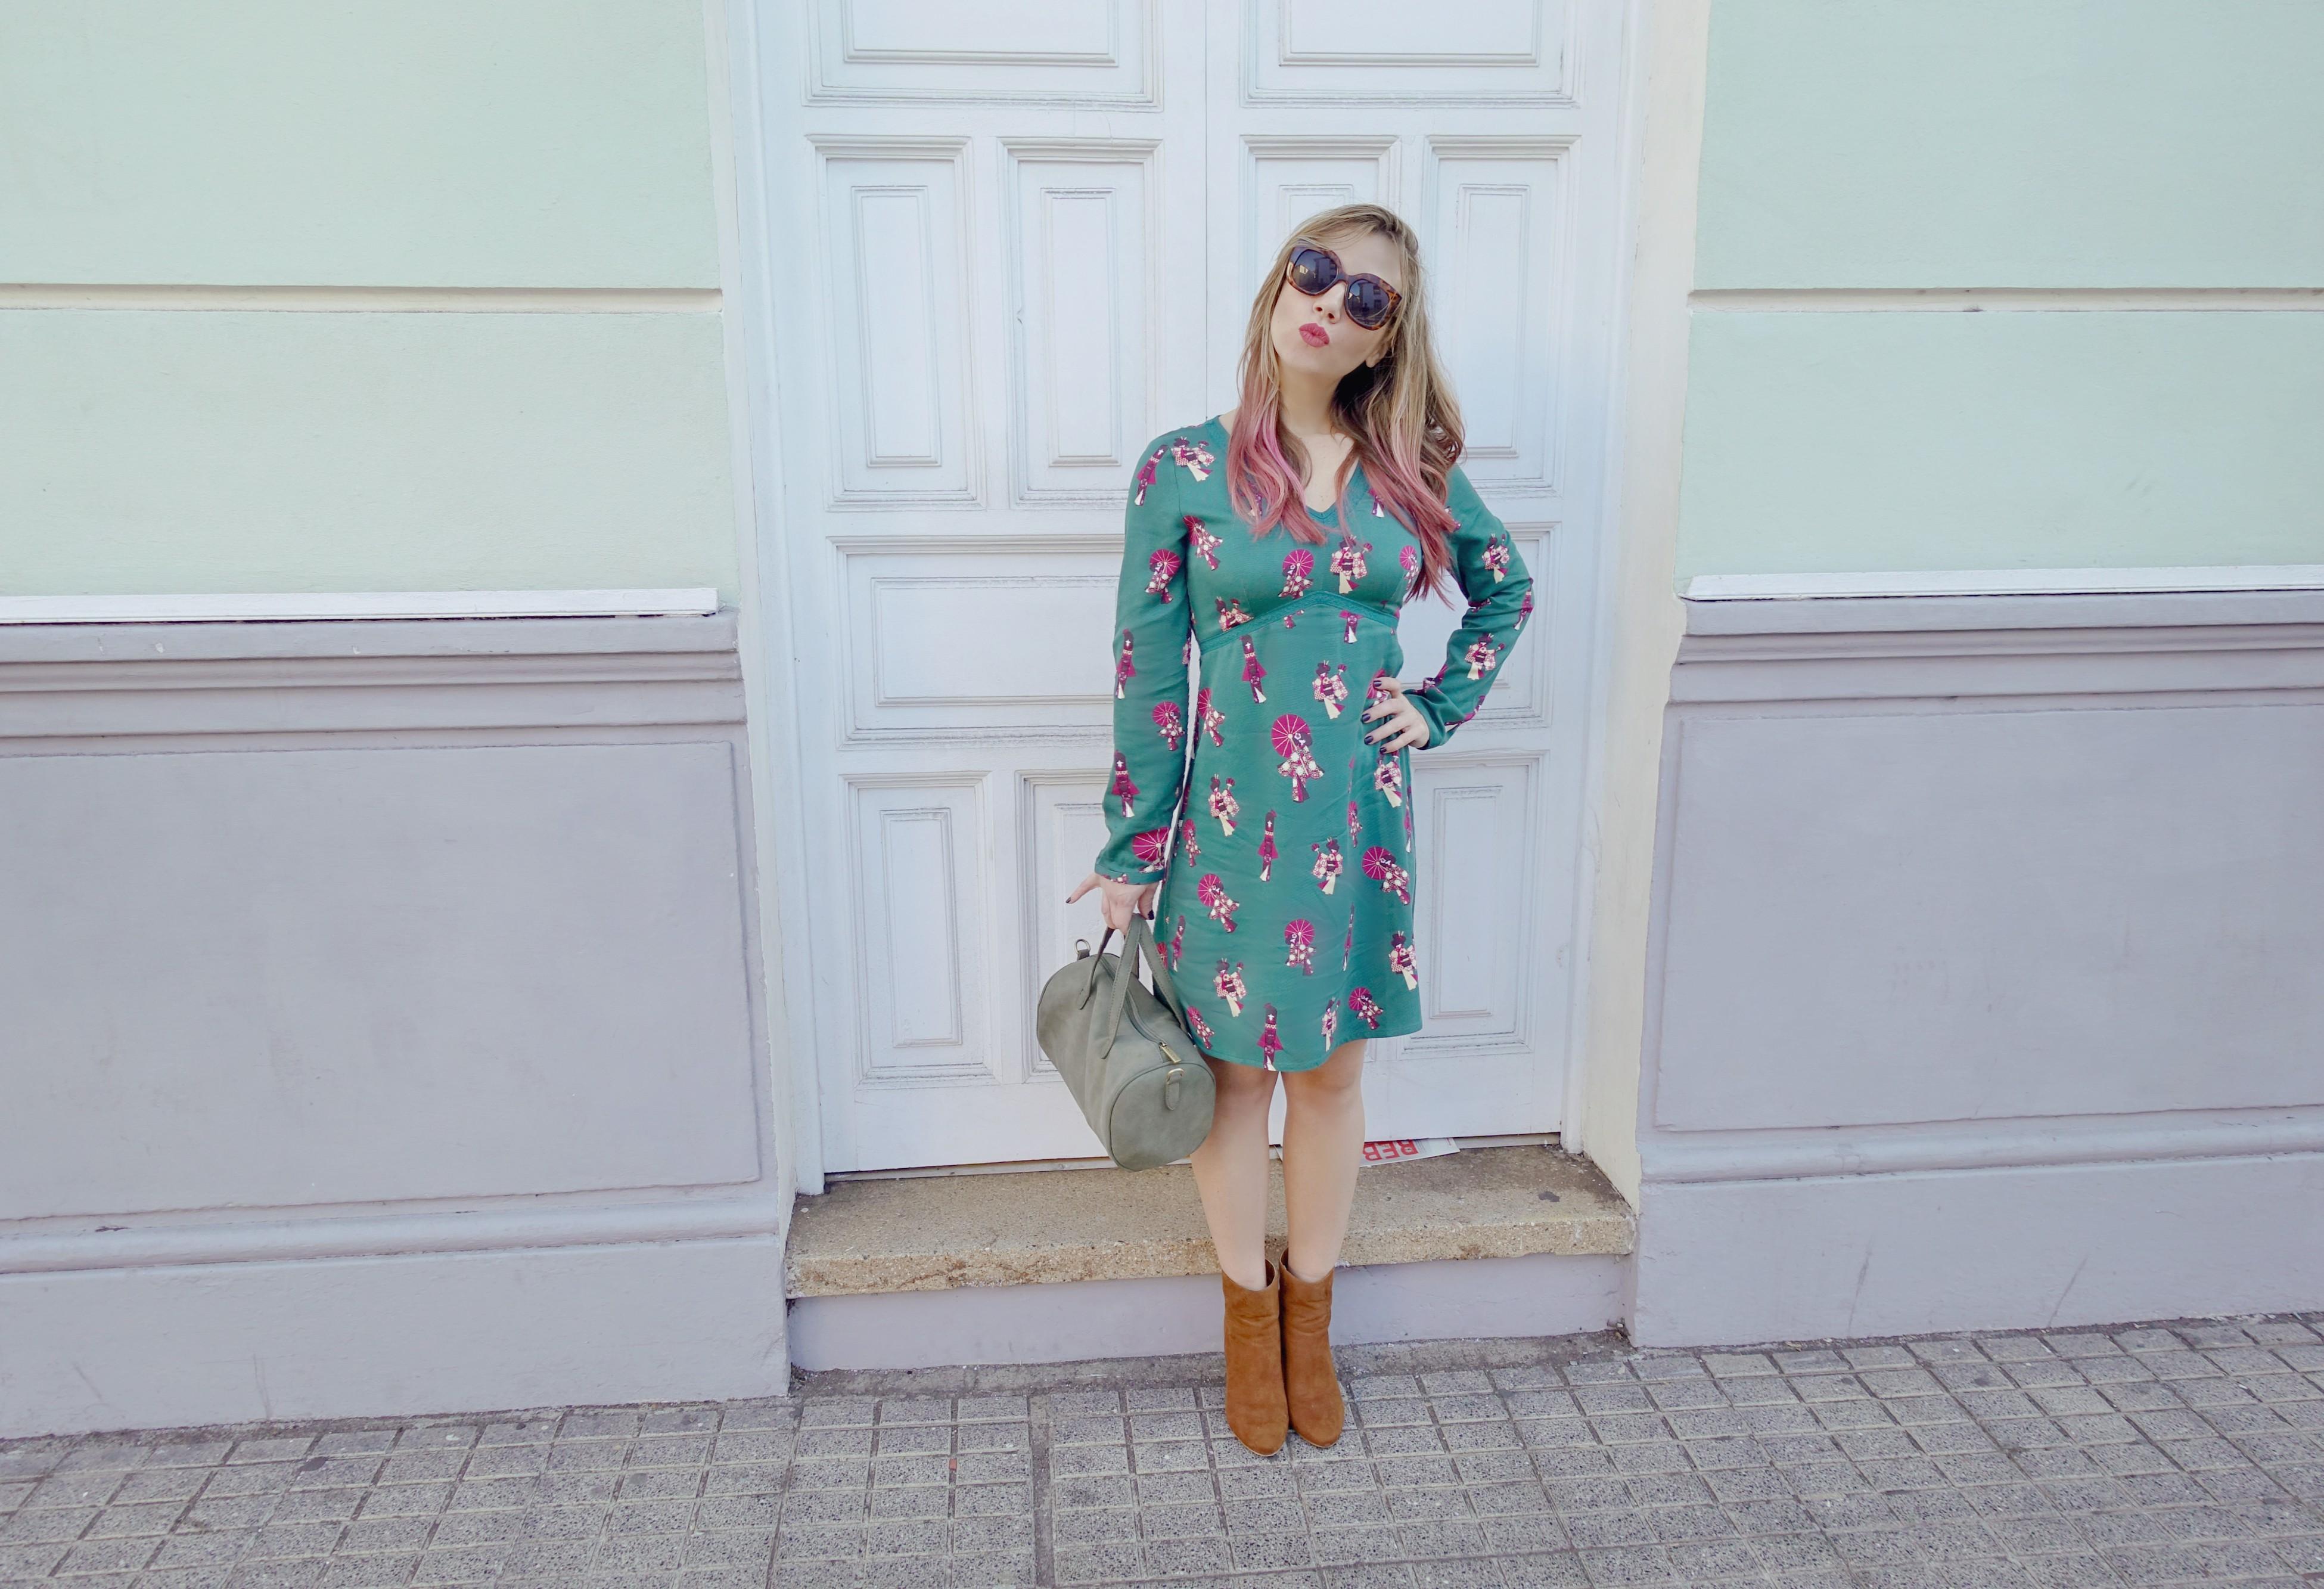 Surkana-blog-de-moda-fashionista-ChicAdicta-influencer-Tenerife-fashion-Chic-Adicta-vestido-verde-PiensaenChic-Piensa-en-Chic